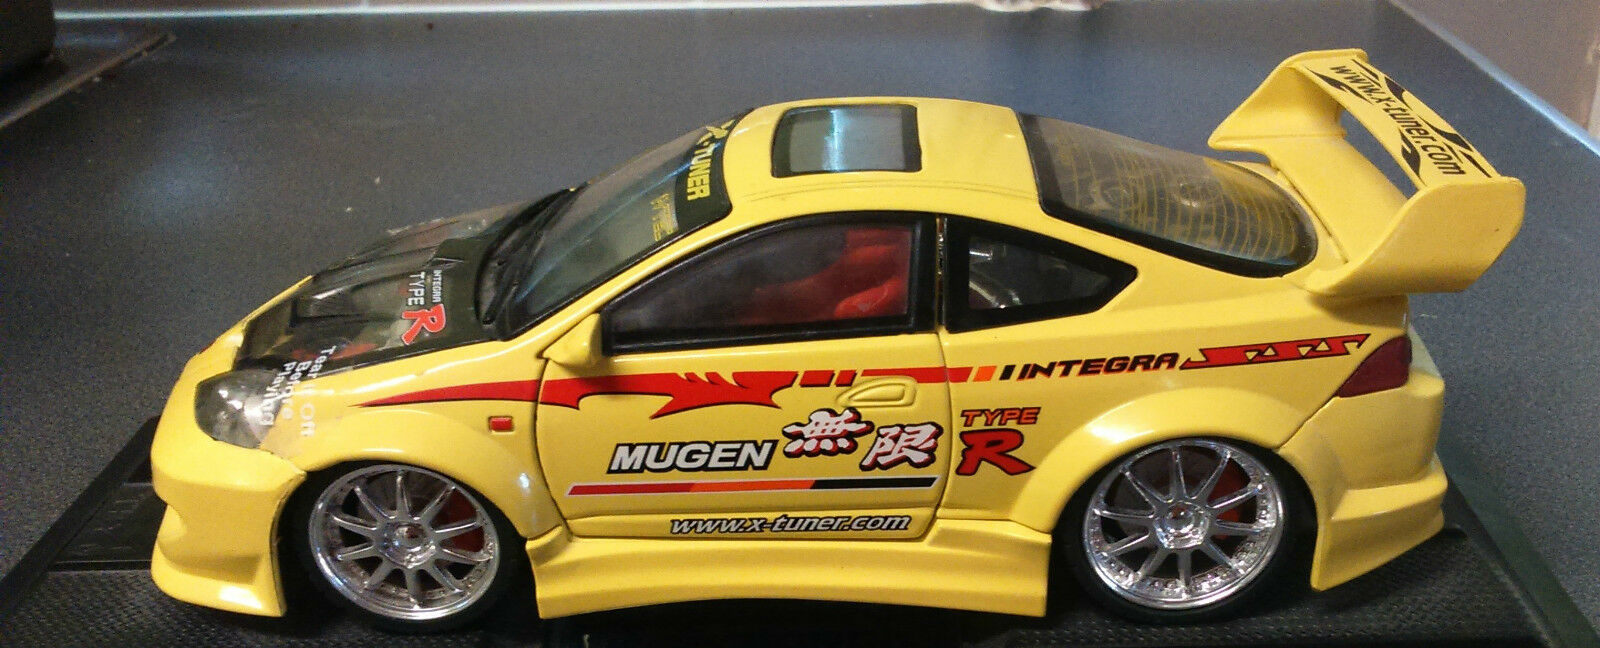 Honda Integra Type R (Mugen) in Yellow Scale 1 24